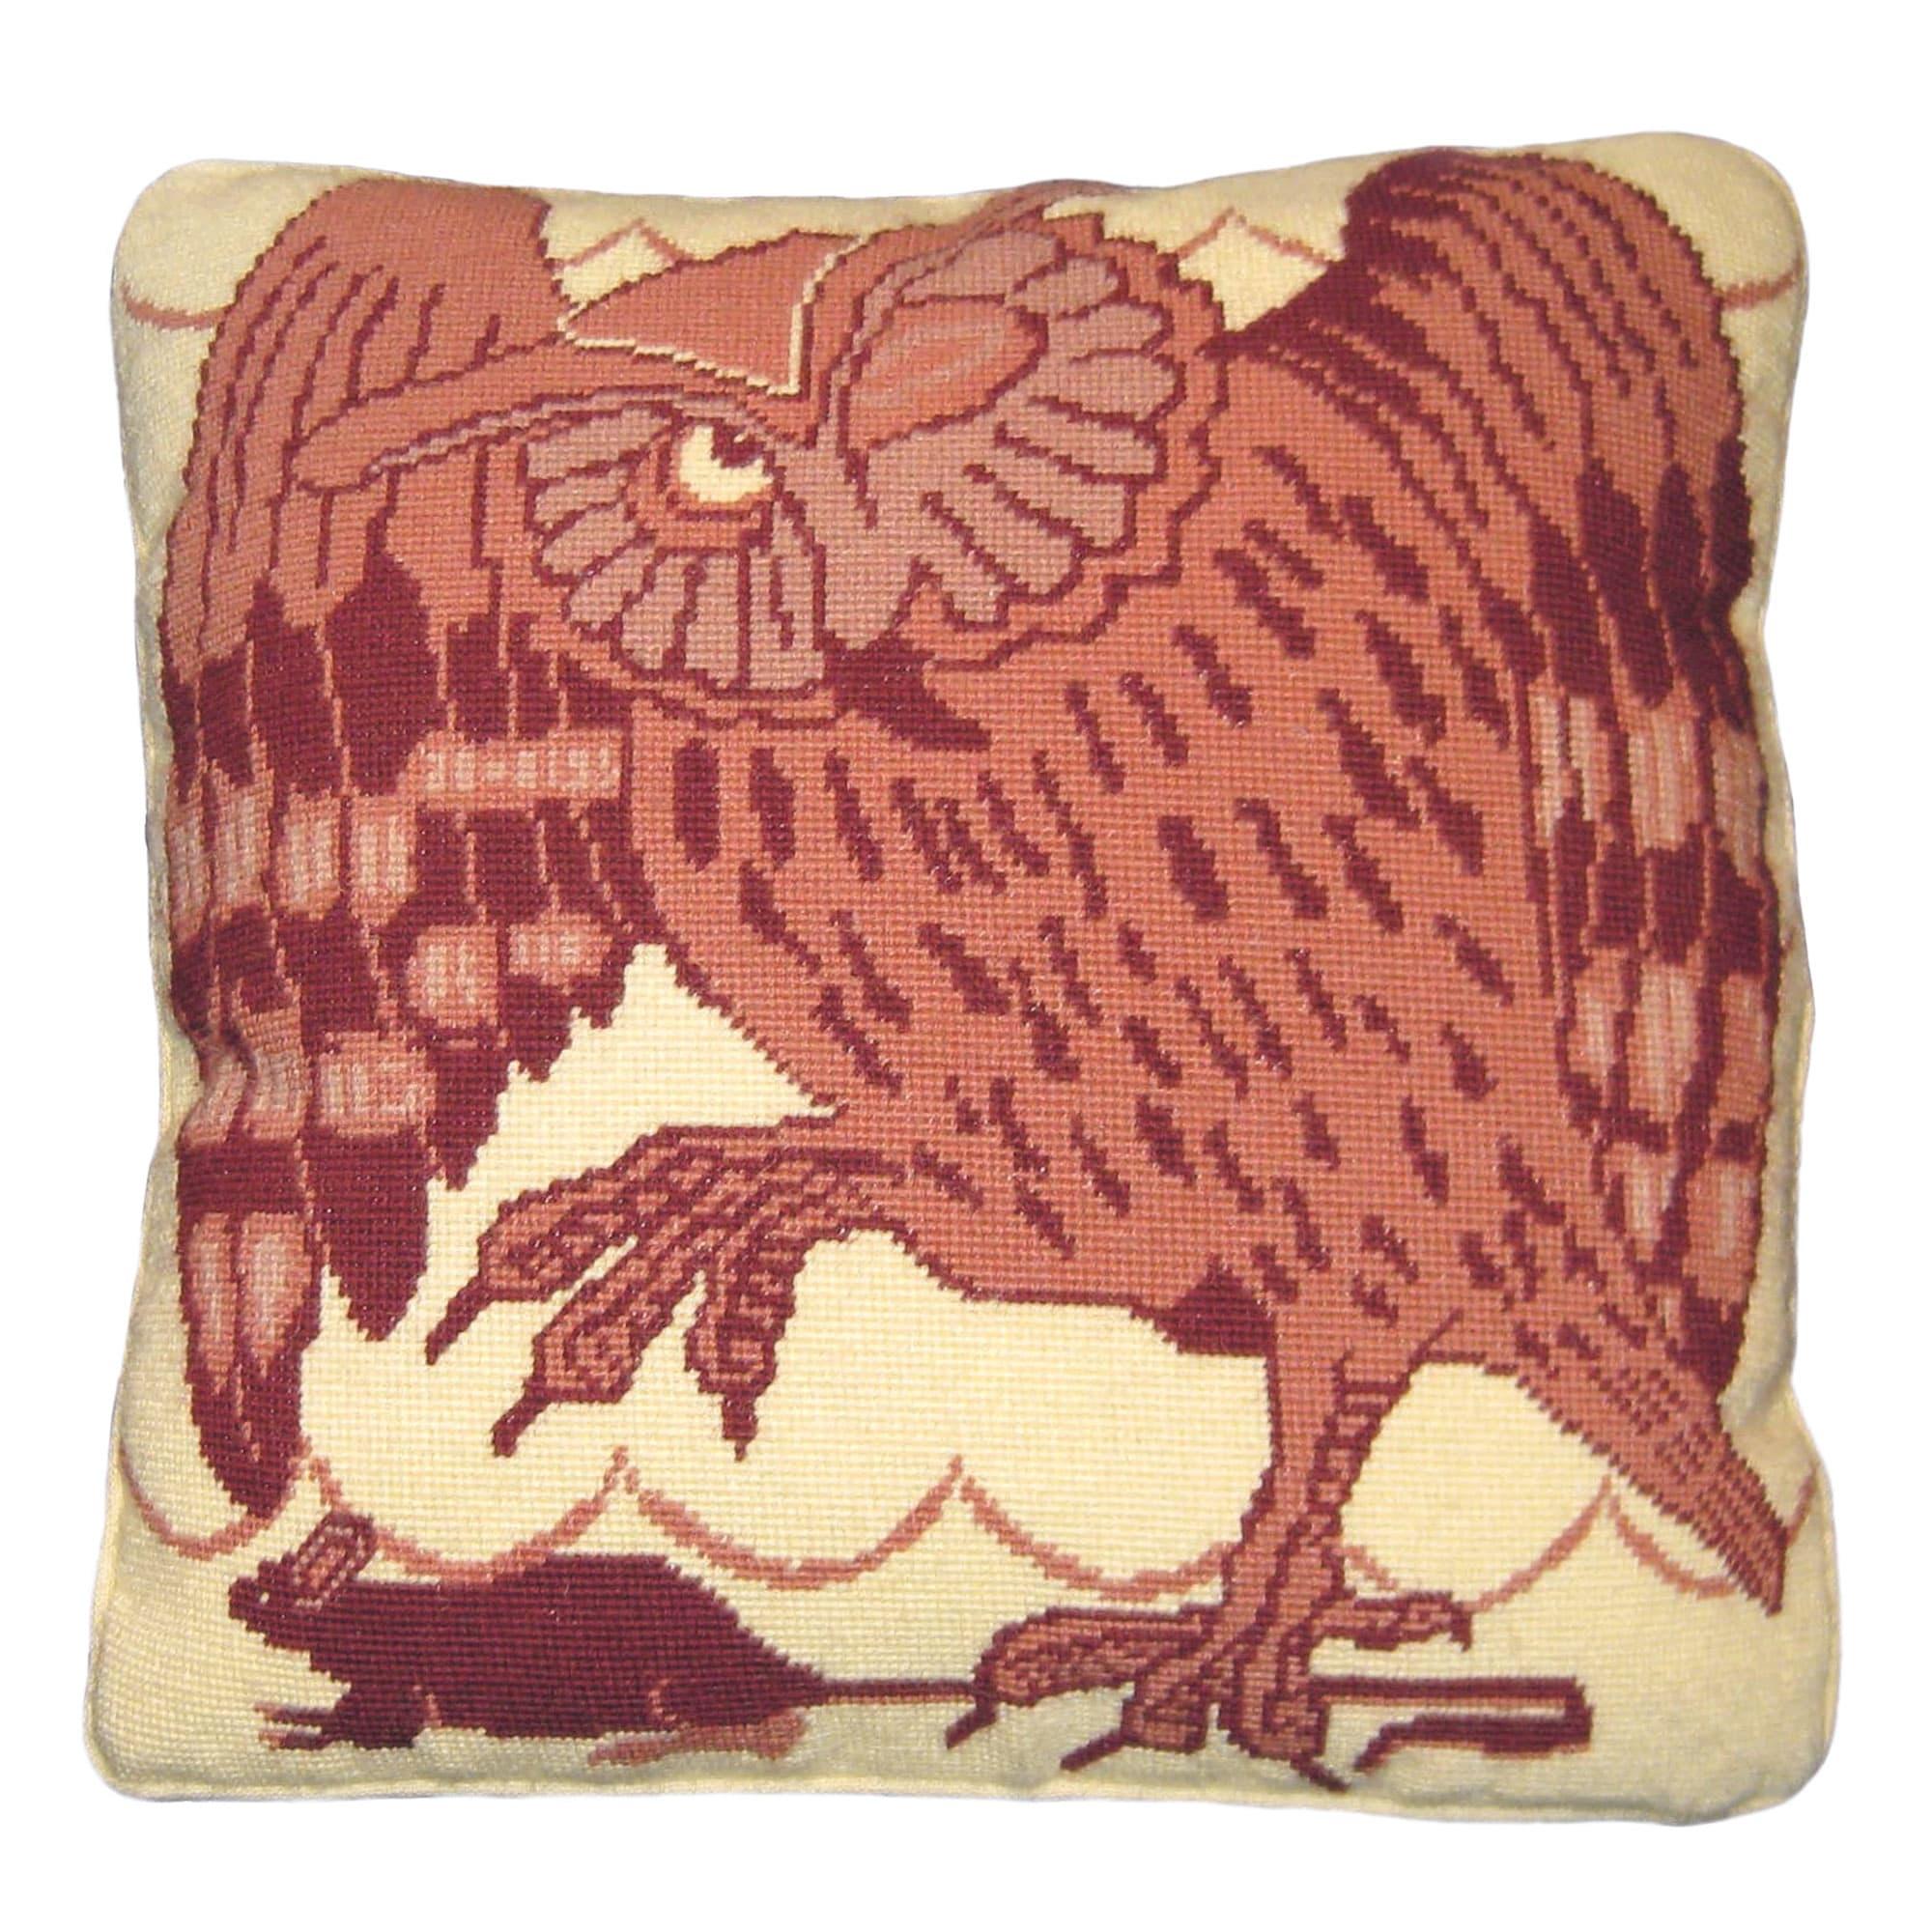 de morgan owl and mouse needlepoint cushion kit